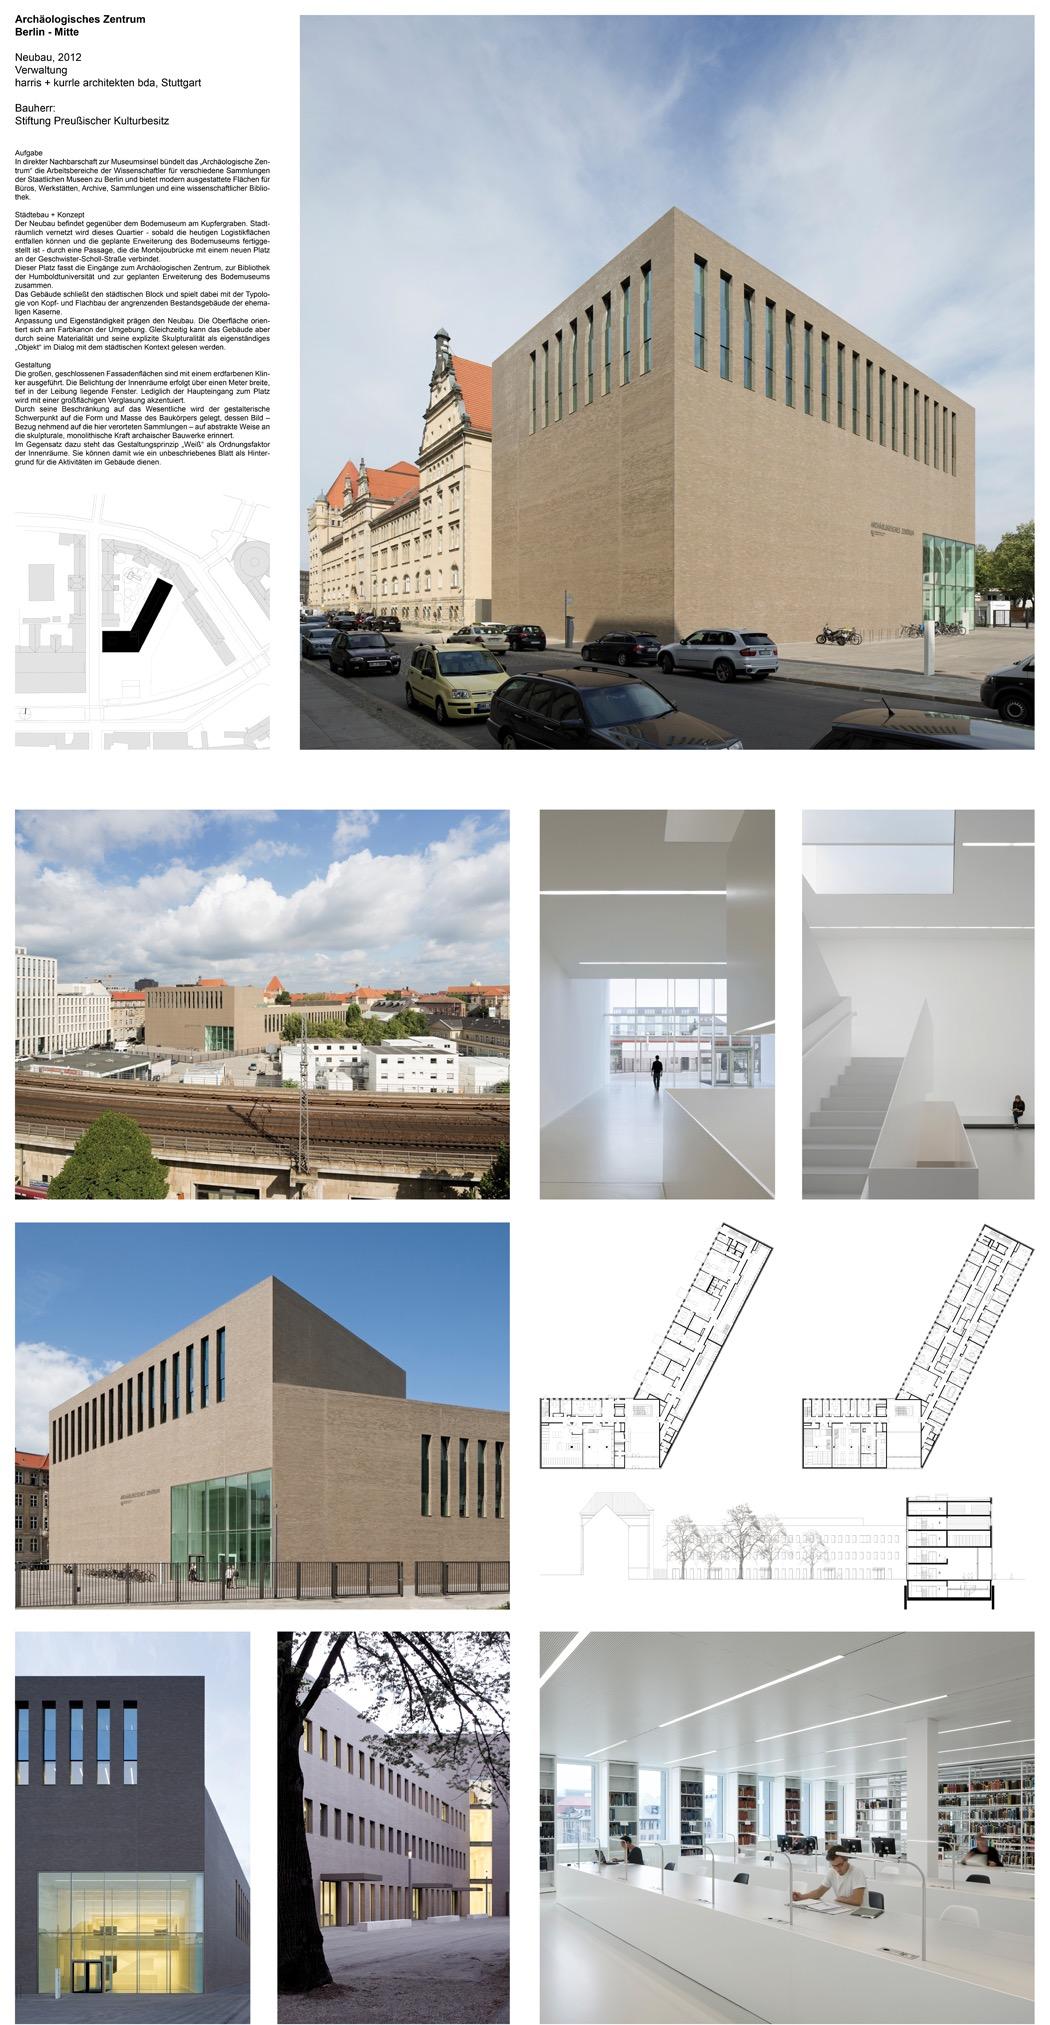 projekte und preistr ger 2015 bda berlin publikumspreis. Black Bedroom Furniture Sets. Home Design Ideas